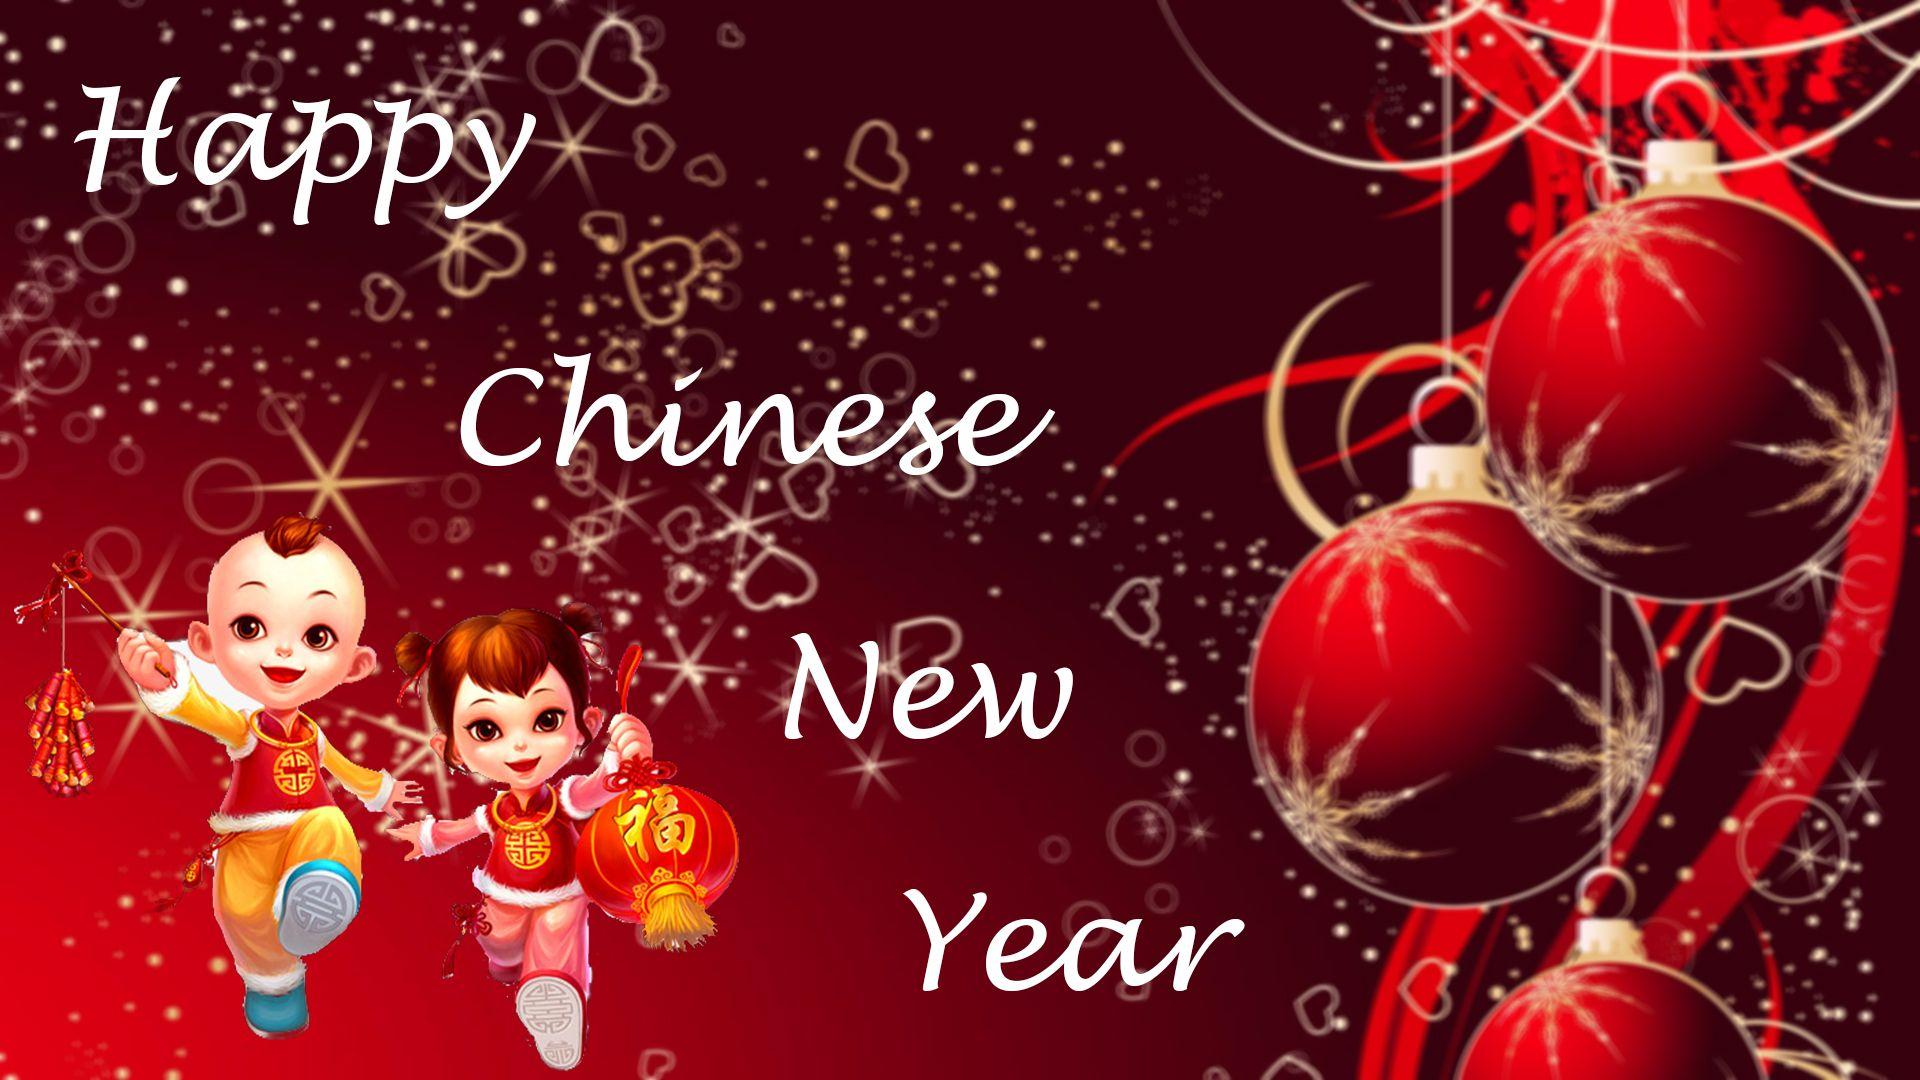 Chinese New Year 2019 Chinese new year, Happy chinese